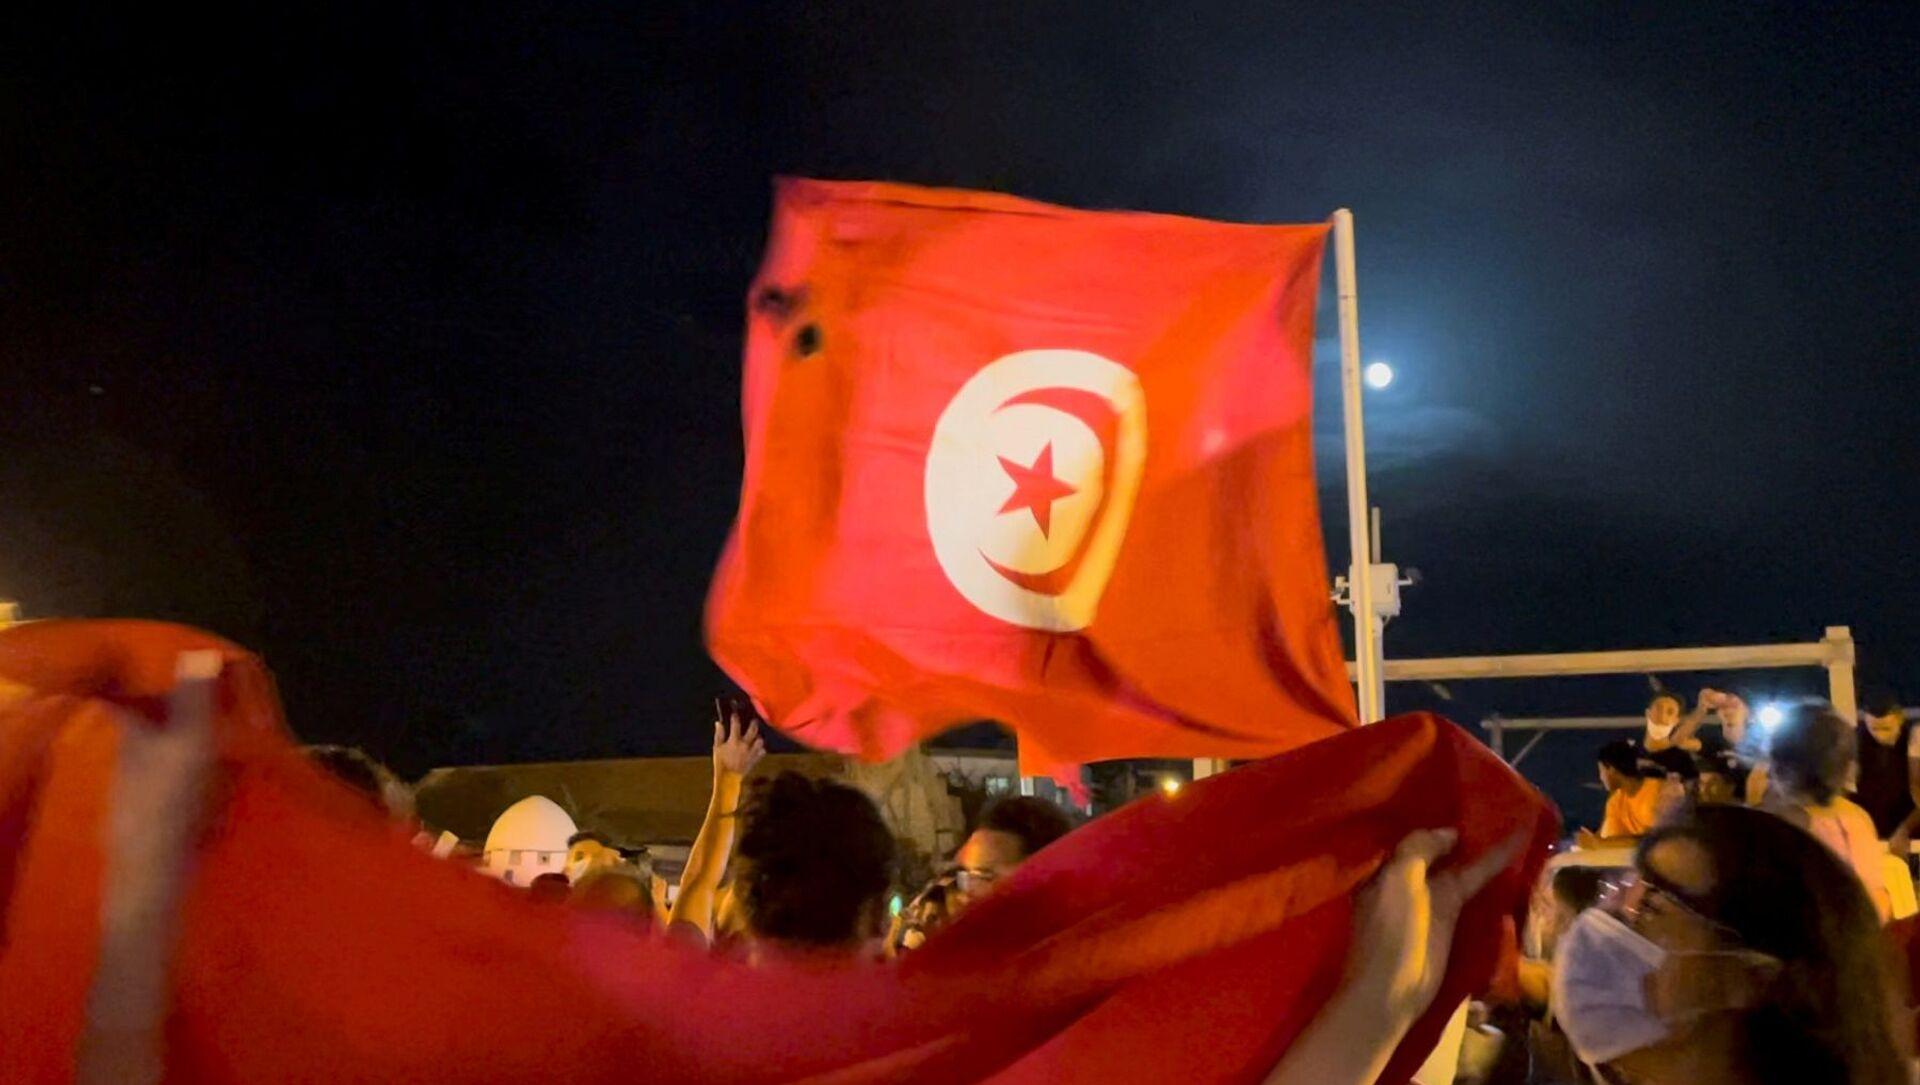 Tunus - protesto - Sputnik Türkiye, 1920, 31.07.2021